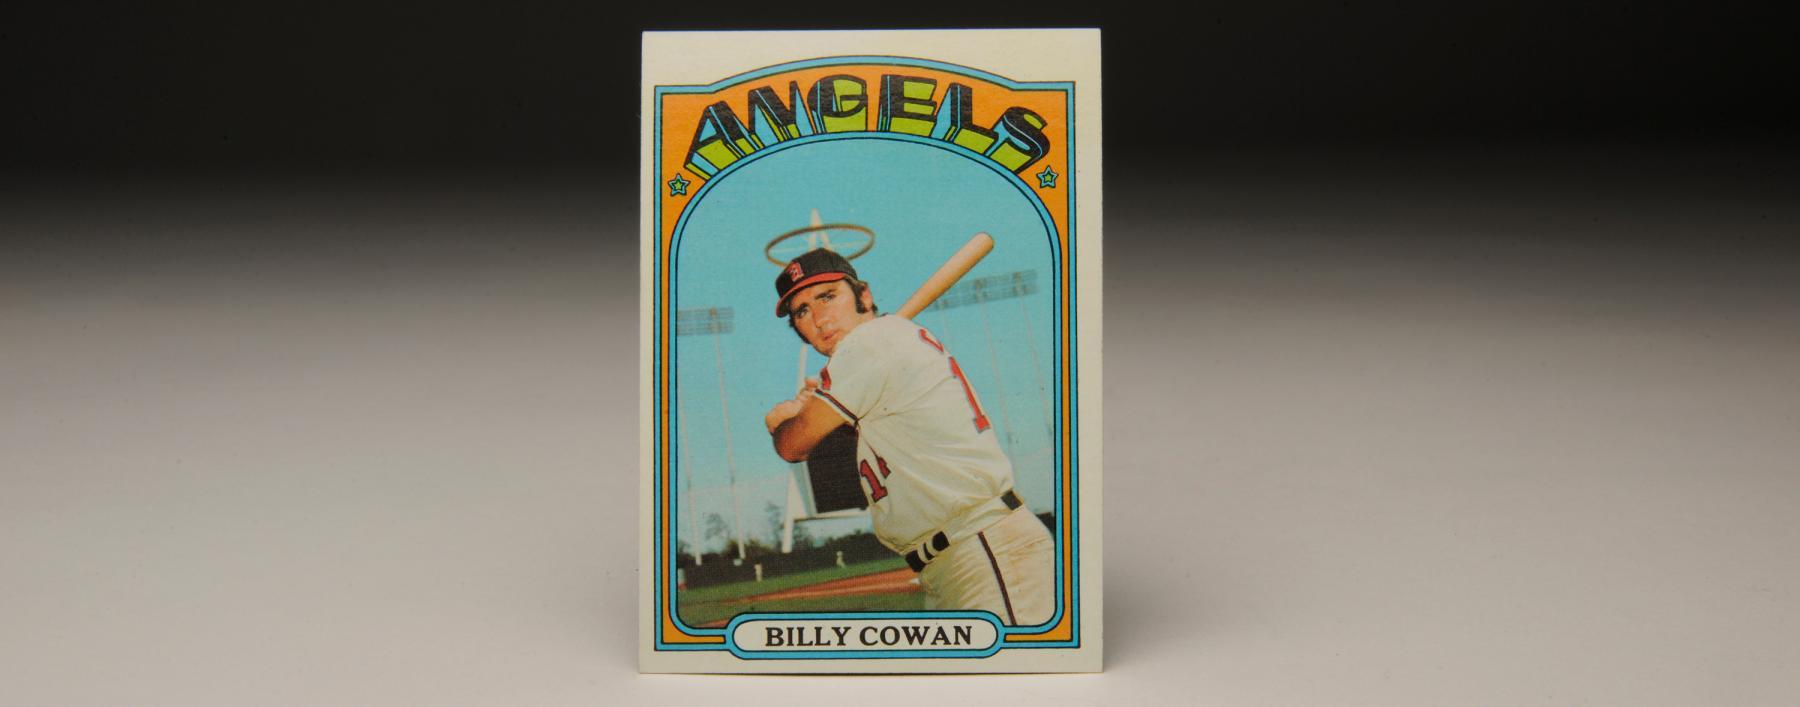 The angelic 1972 Bill Cowan Topps card. (Milo Stewart, Jr. / National Baseball Hall of Fame)